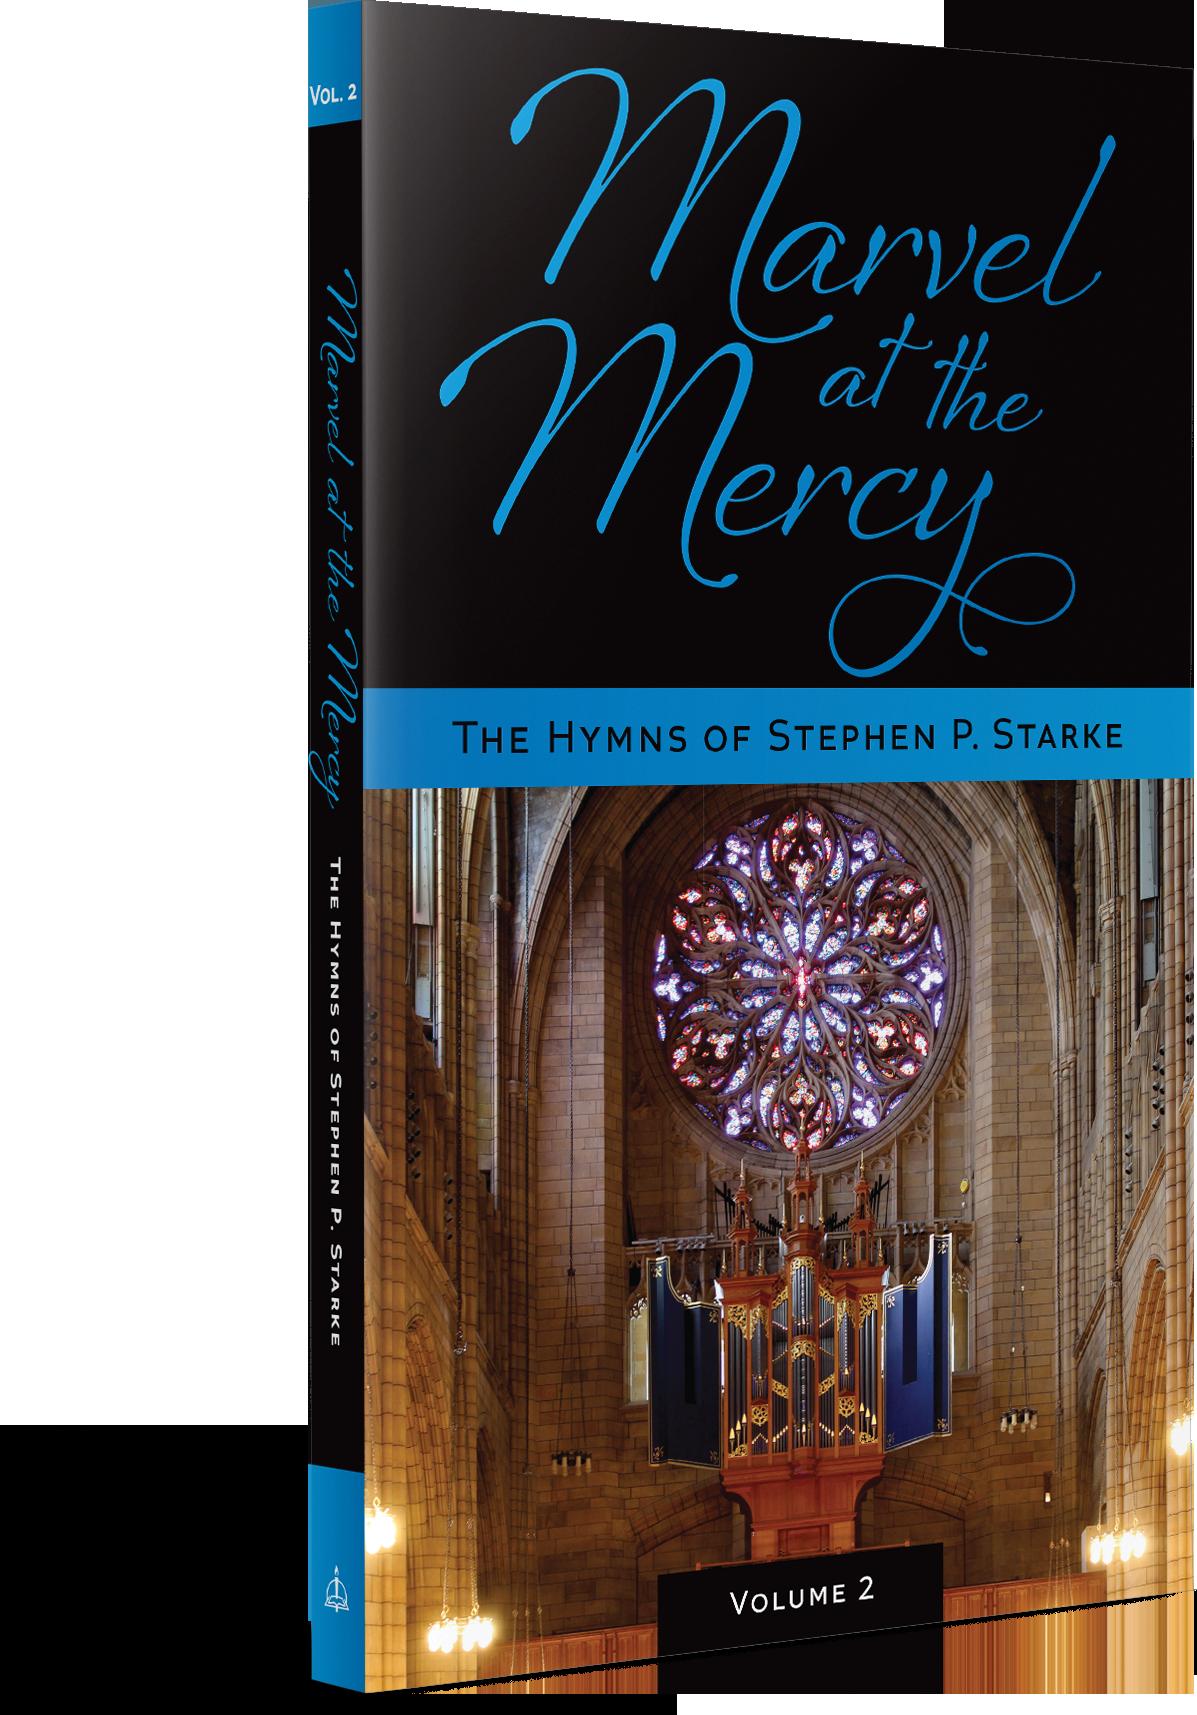 Marvel at the Mercy